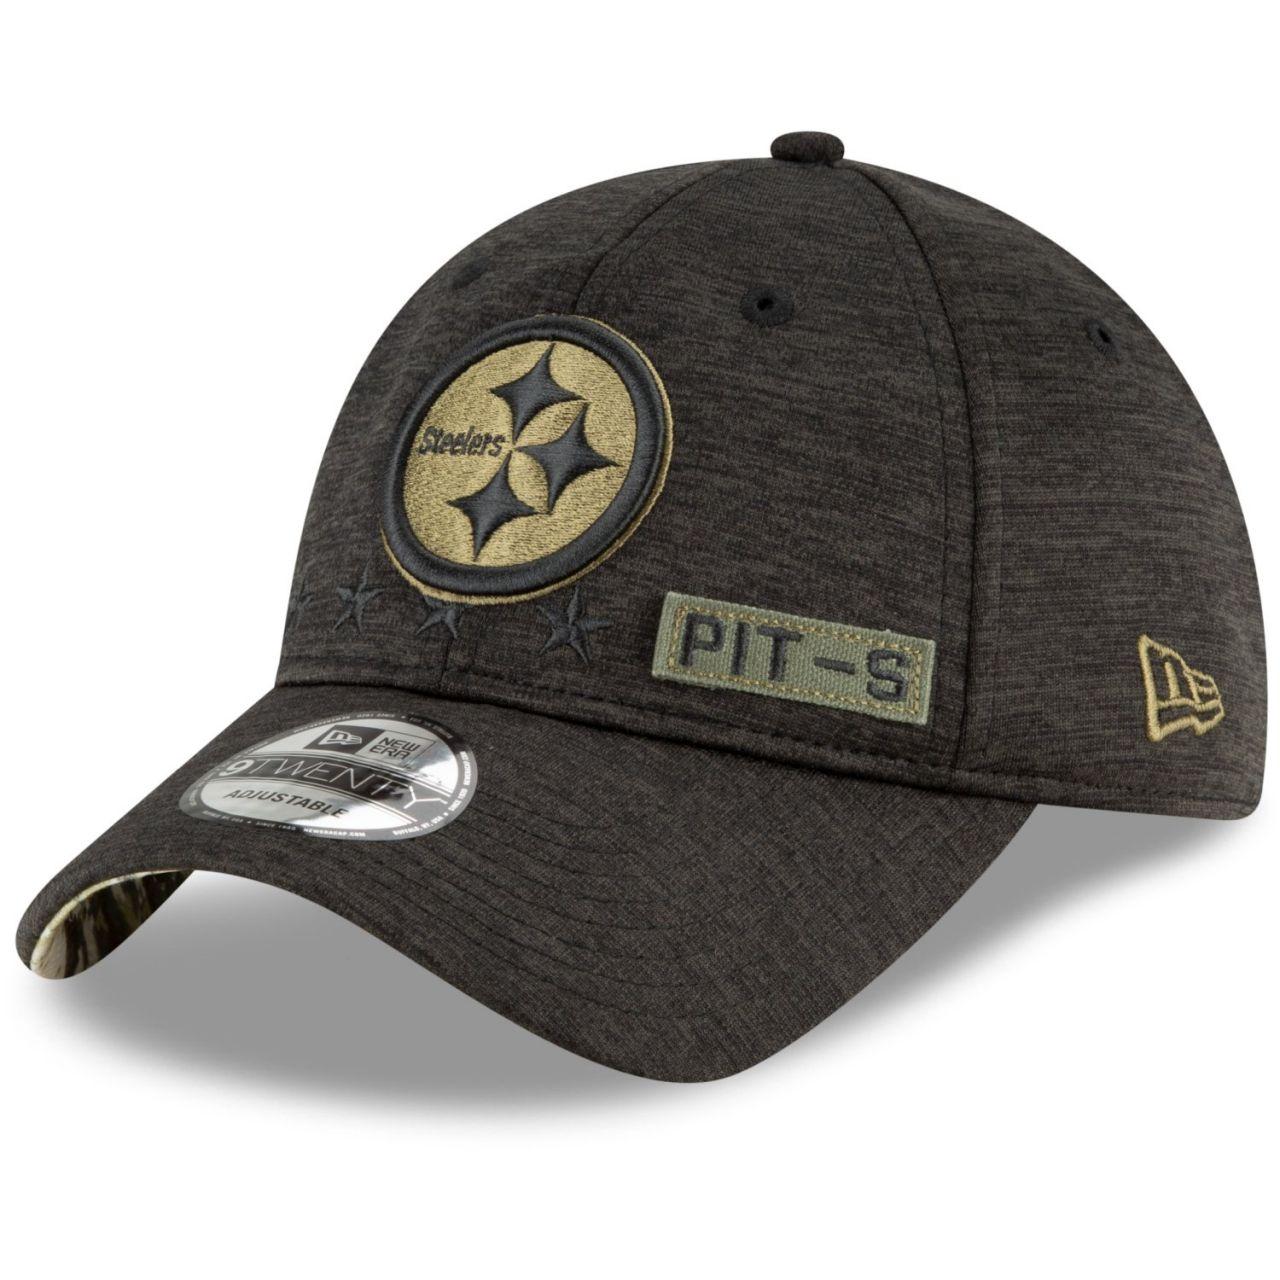 amfoo - New Era 9TWENTY Cap Salute to Service Pittsburgh Steelers